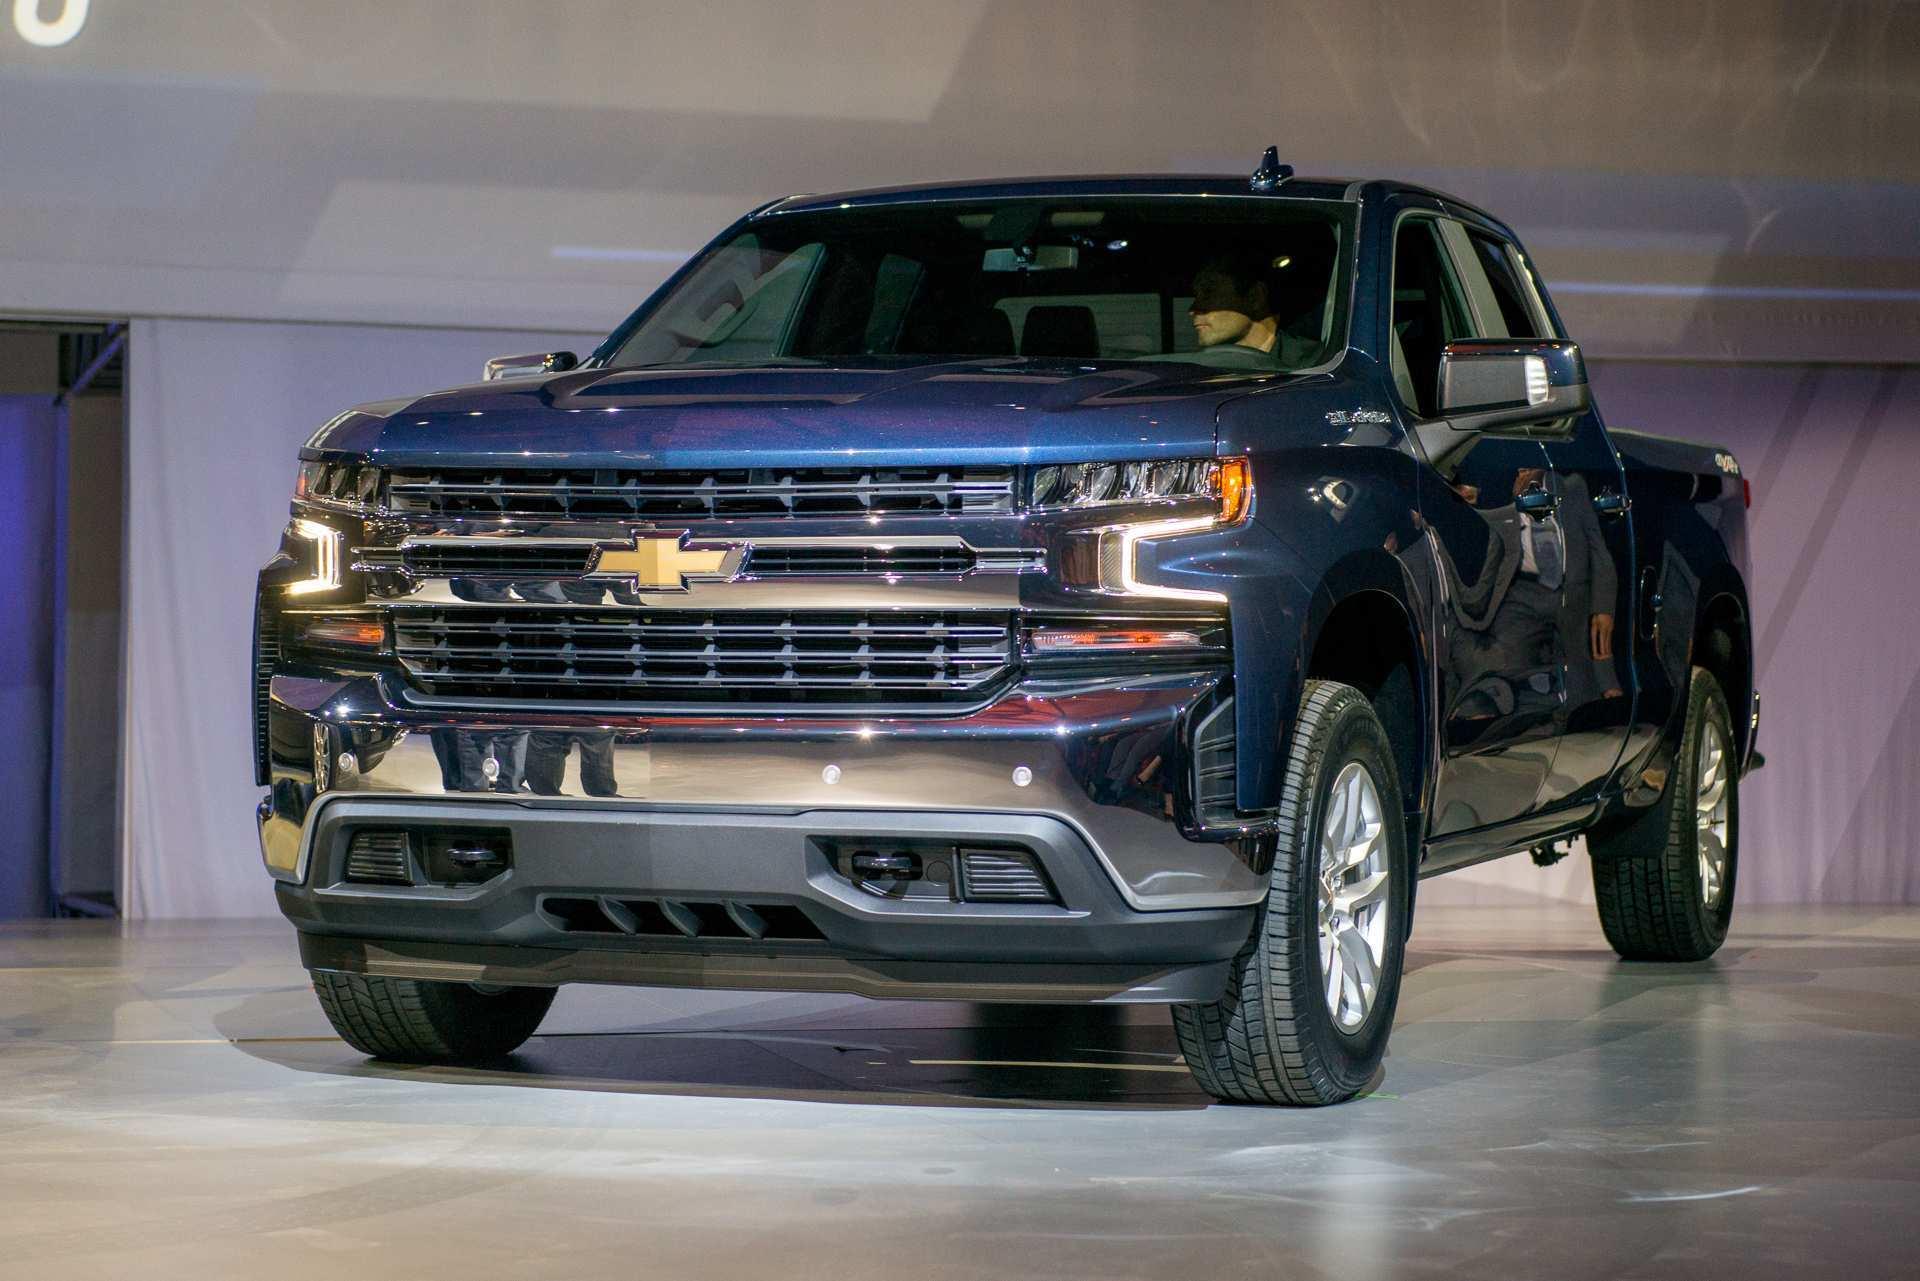 37 Best Review 2019 Chevrolet Silverado Aluminum Price by 2019 Chevrolet Silverado Aluminum